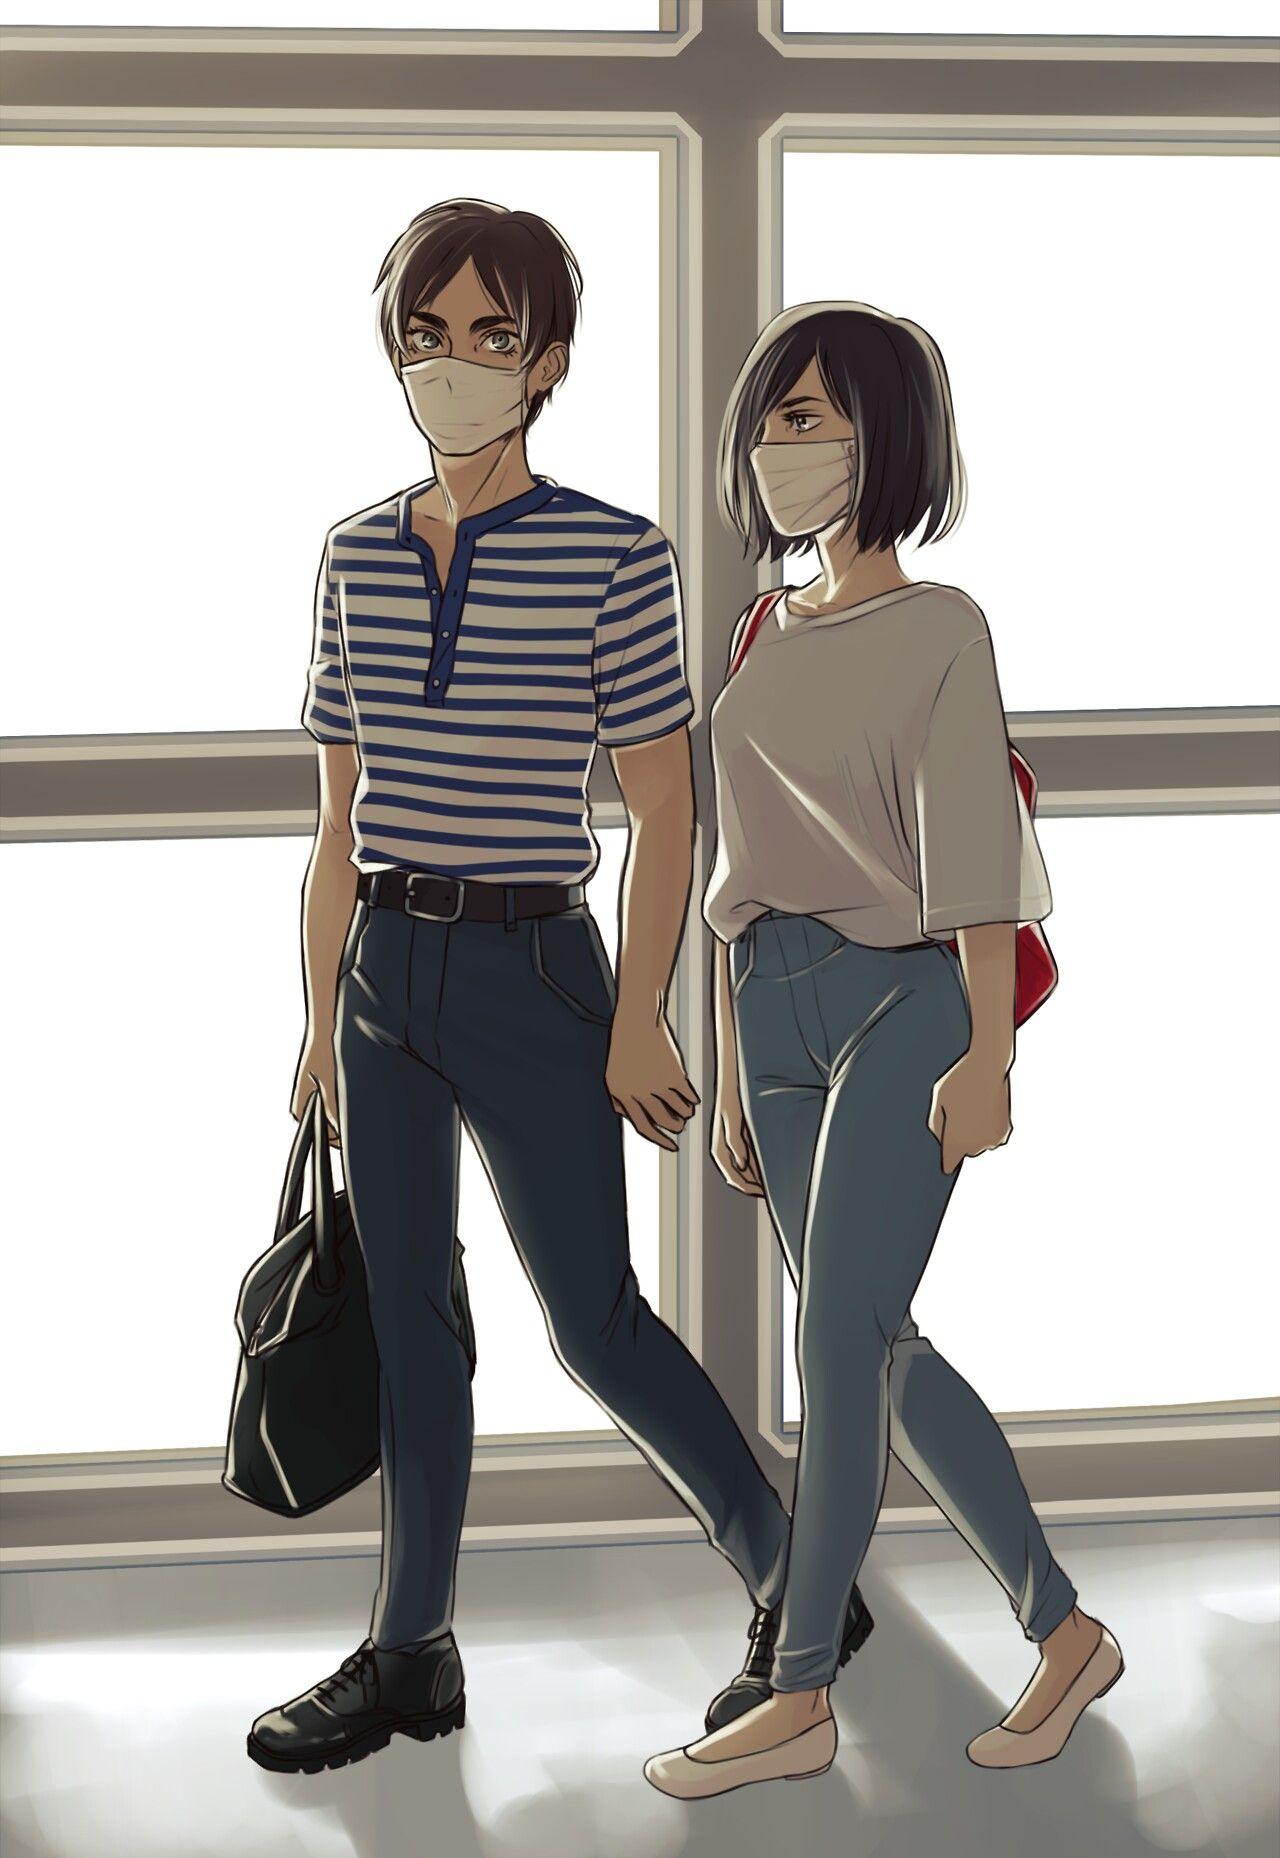 Eren And Mikasa As Kpop Idols Attack On Titan Anime Attack On Titan Eren Eren And Mikasa